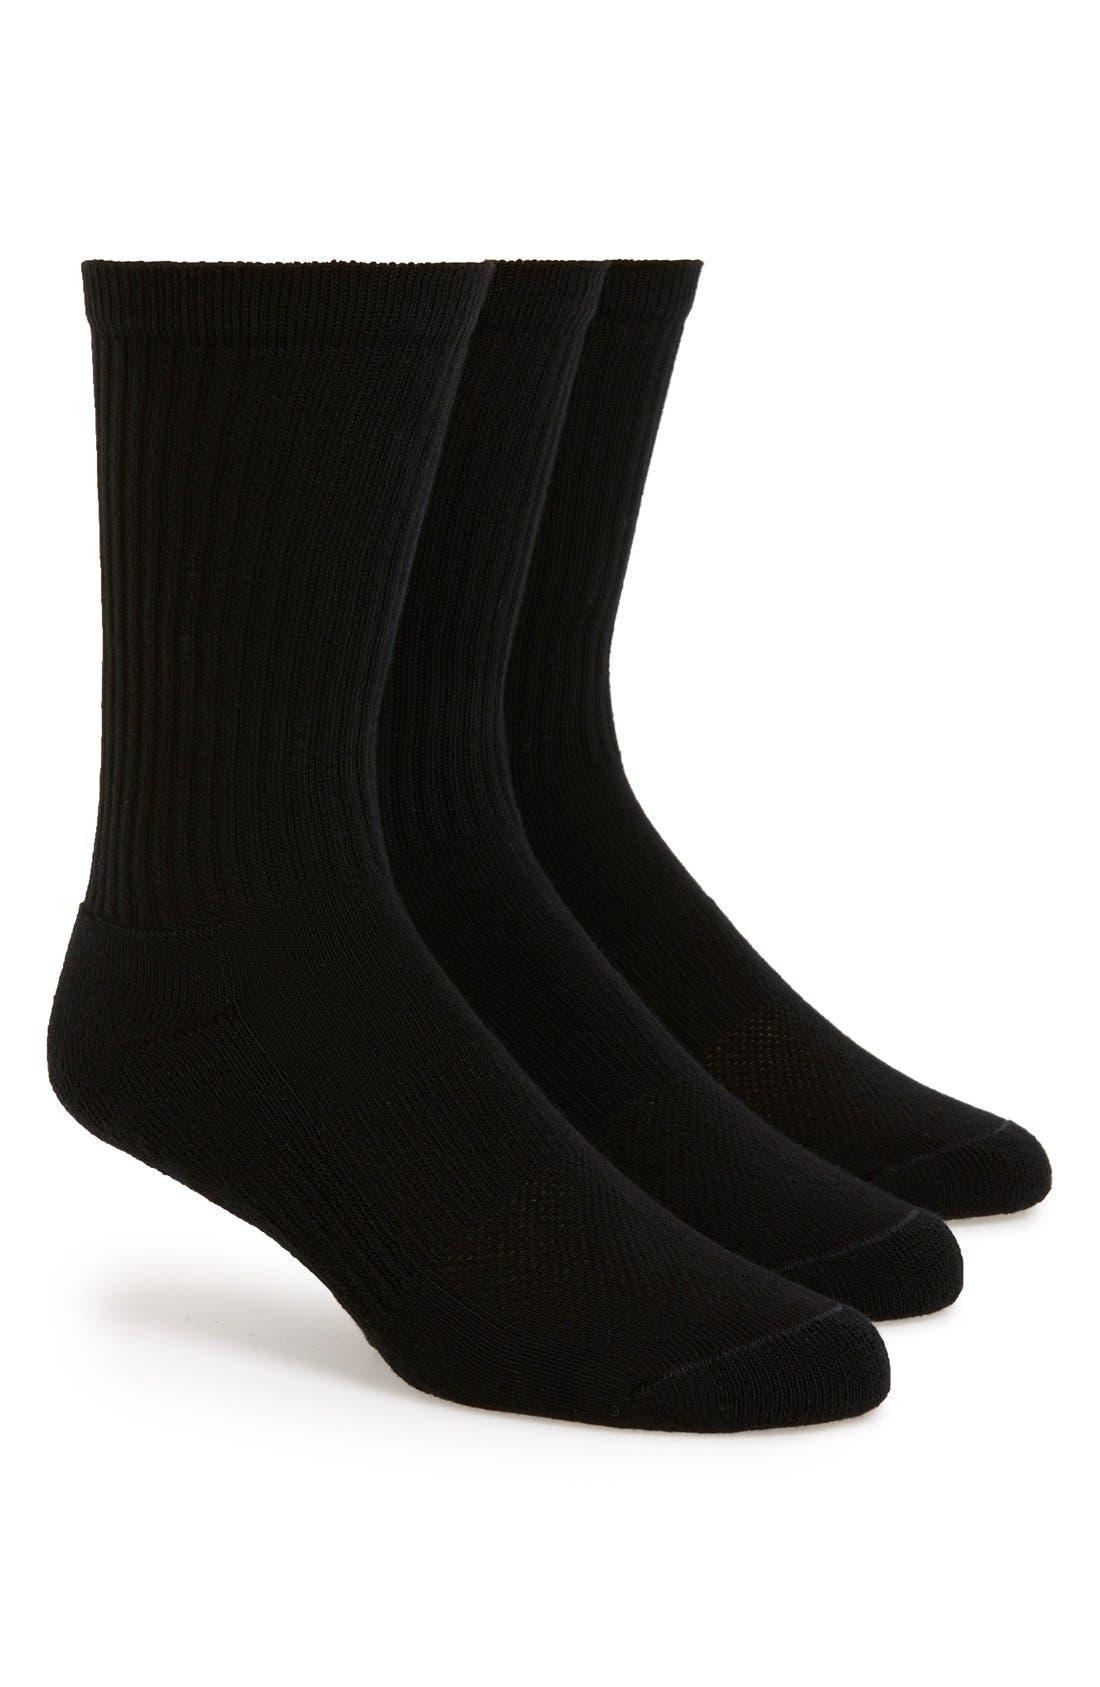 NORDSTROM MEN'S SHOP, 3-Pack Athletic Socks, Main thumbnail 1, color, BLACK